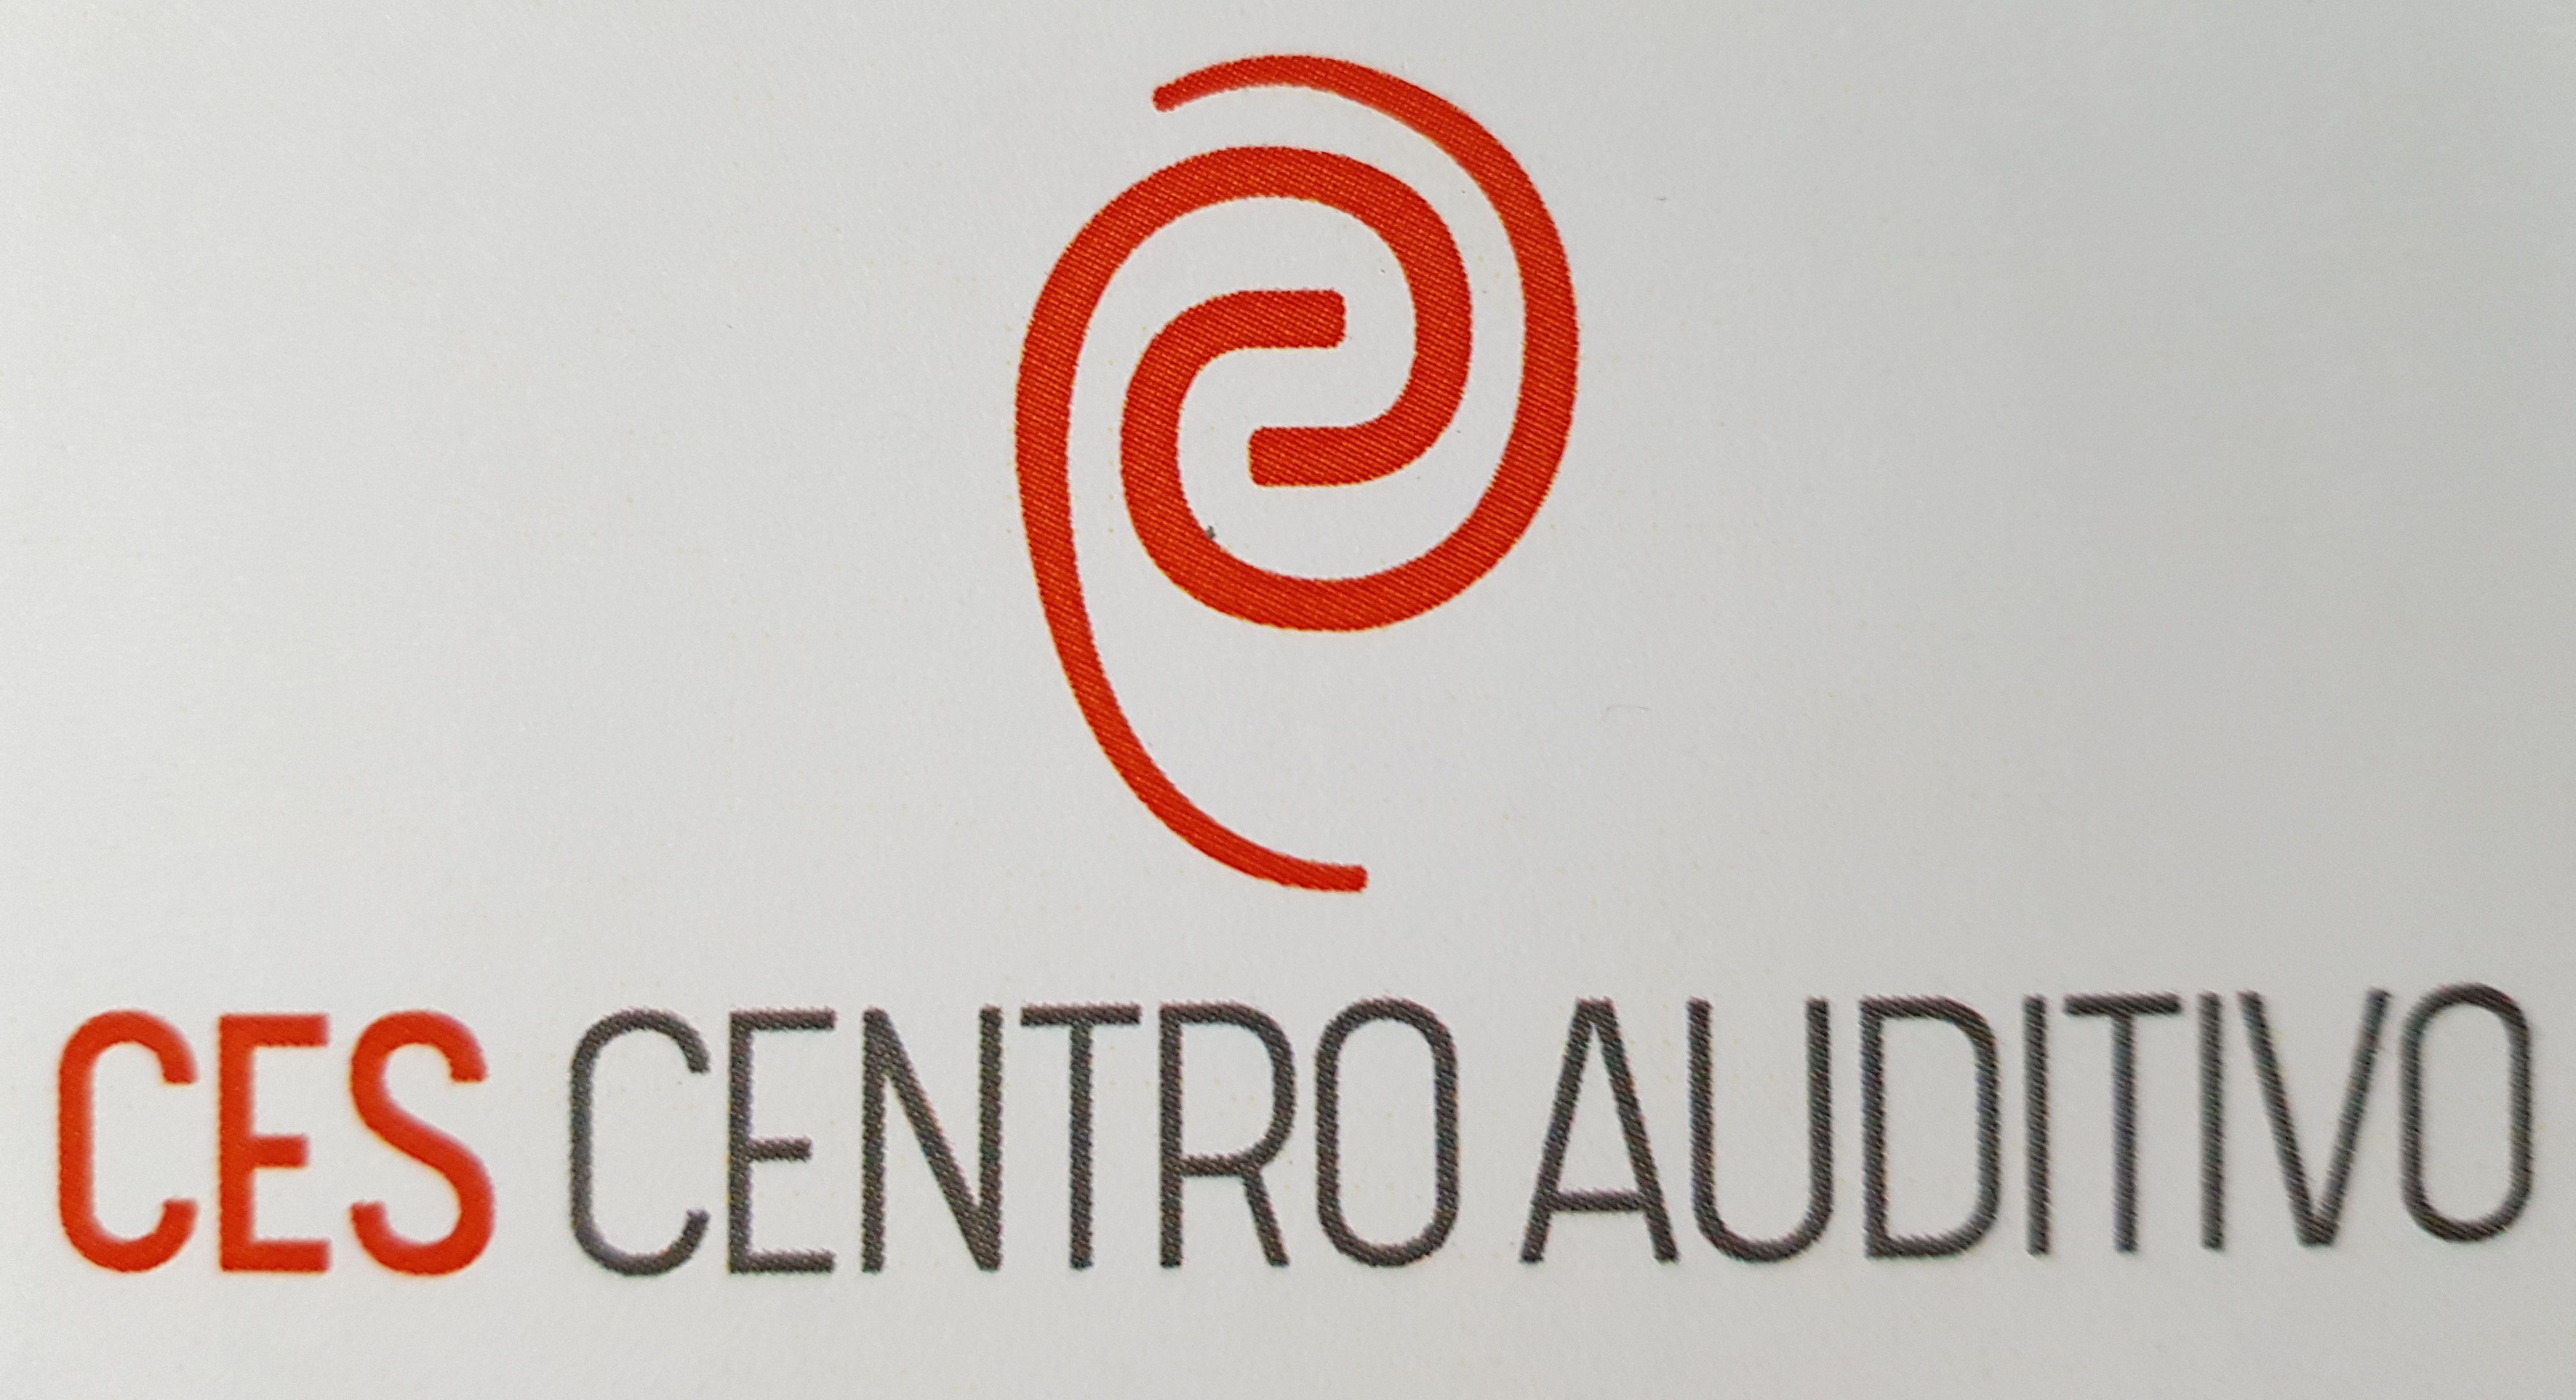 Ces Centro Auditivo